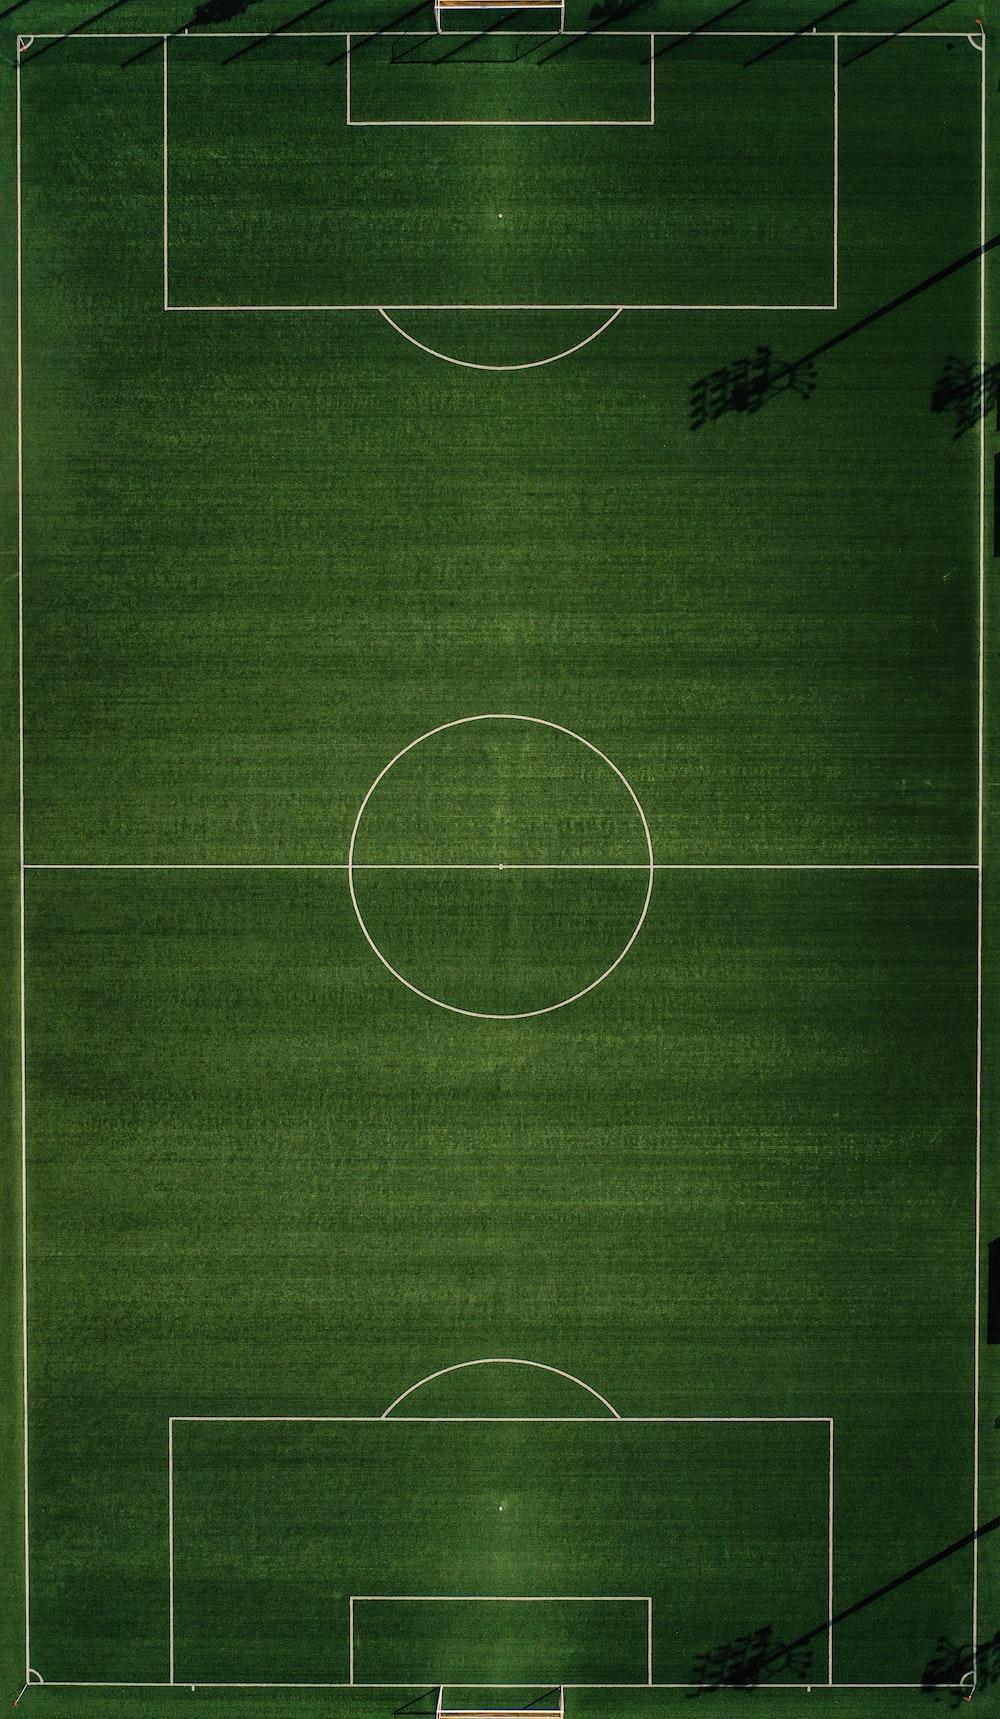 green sports court illustration